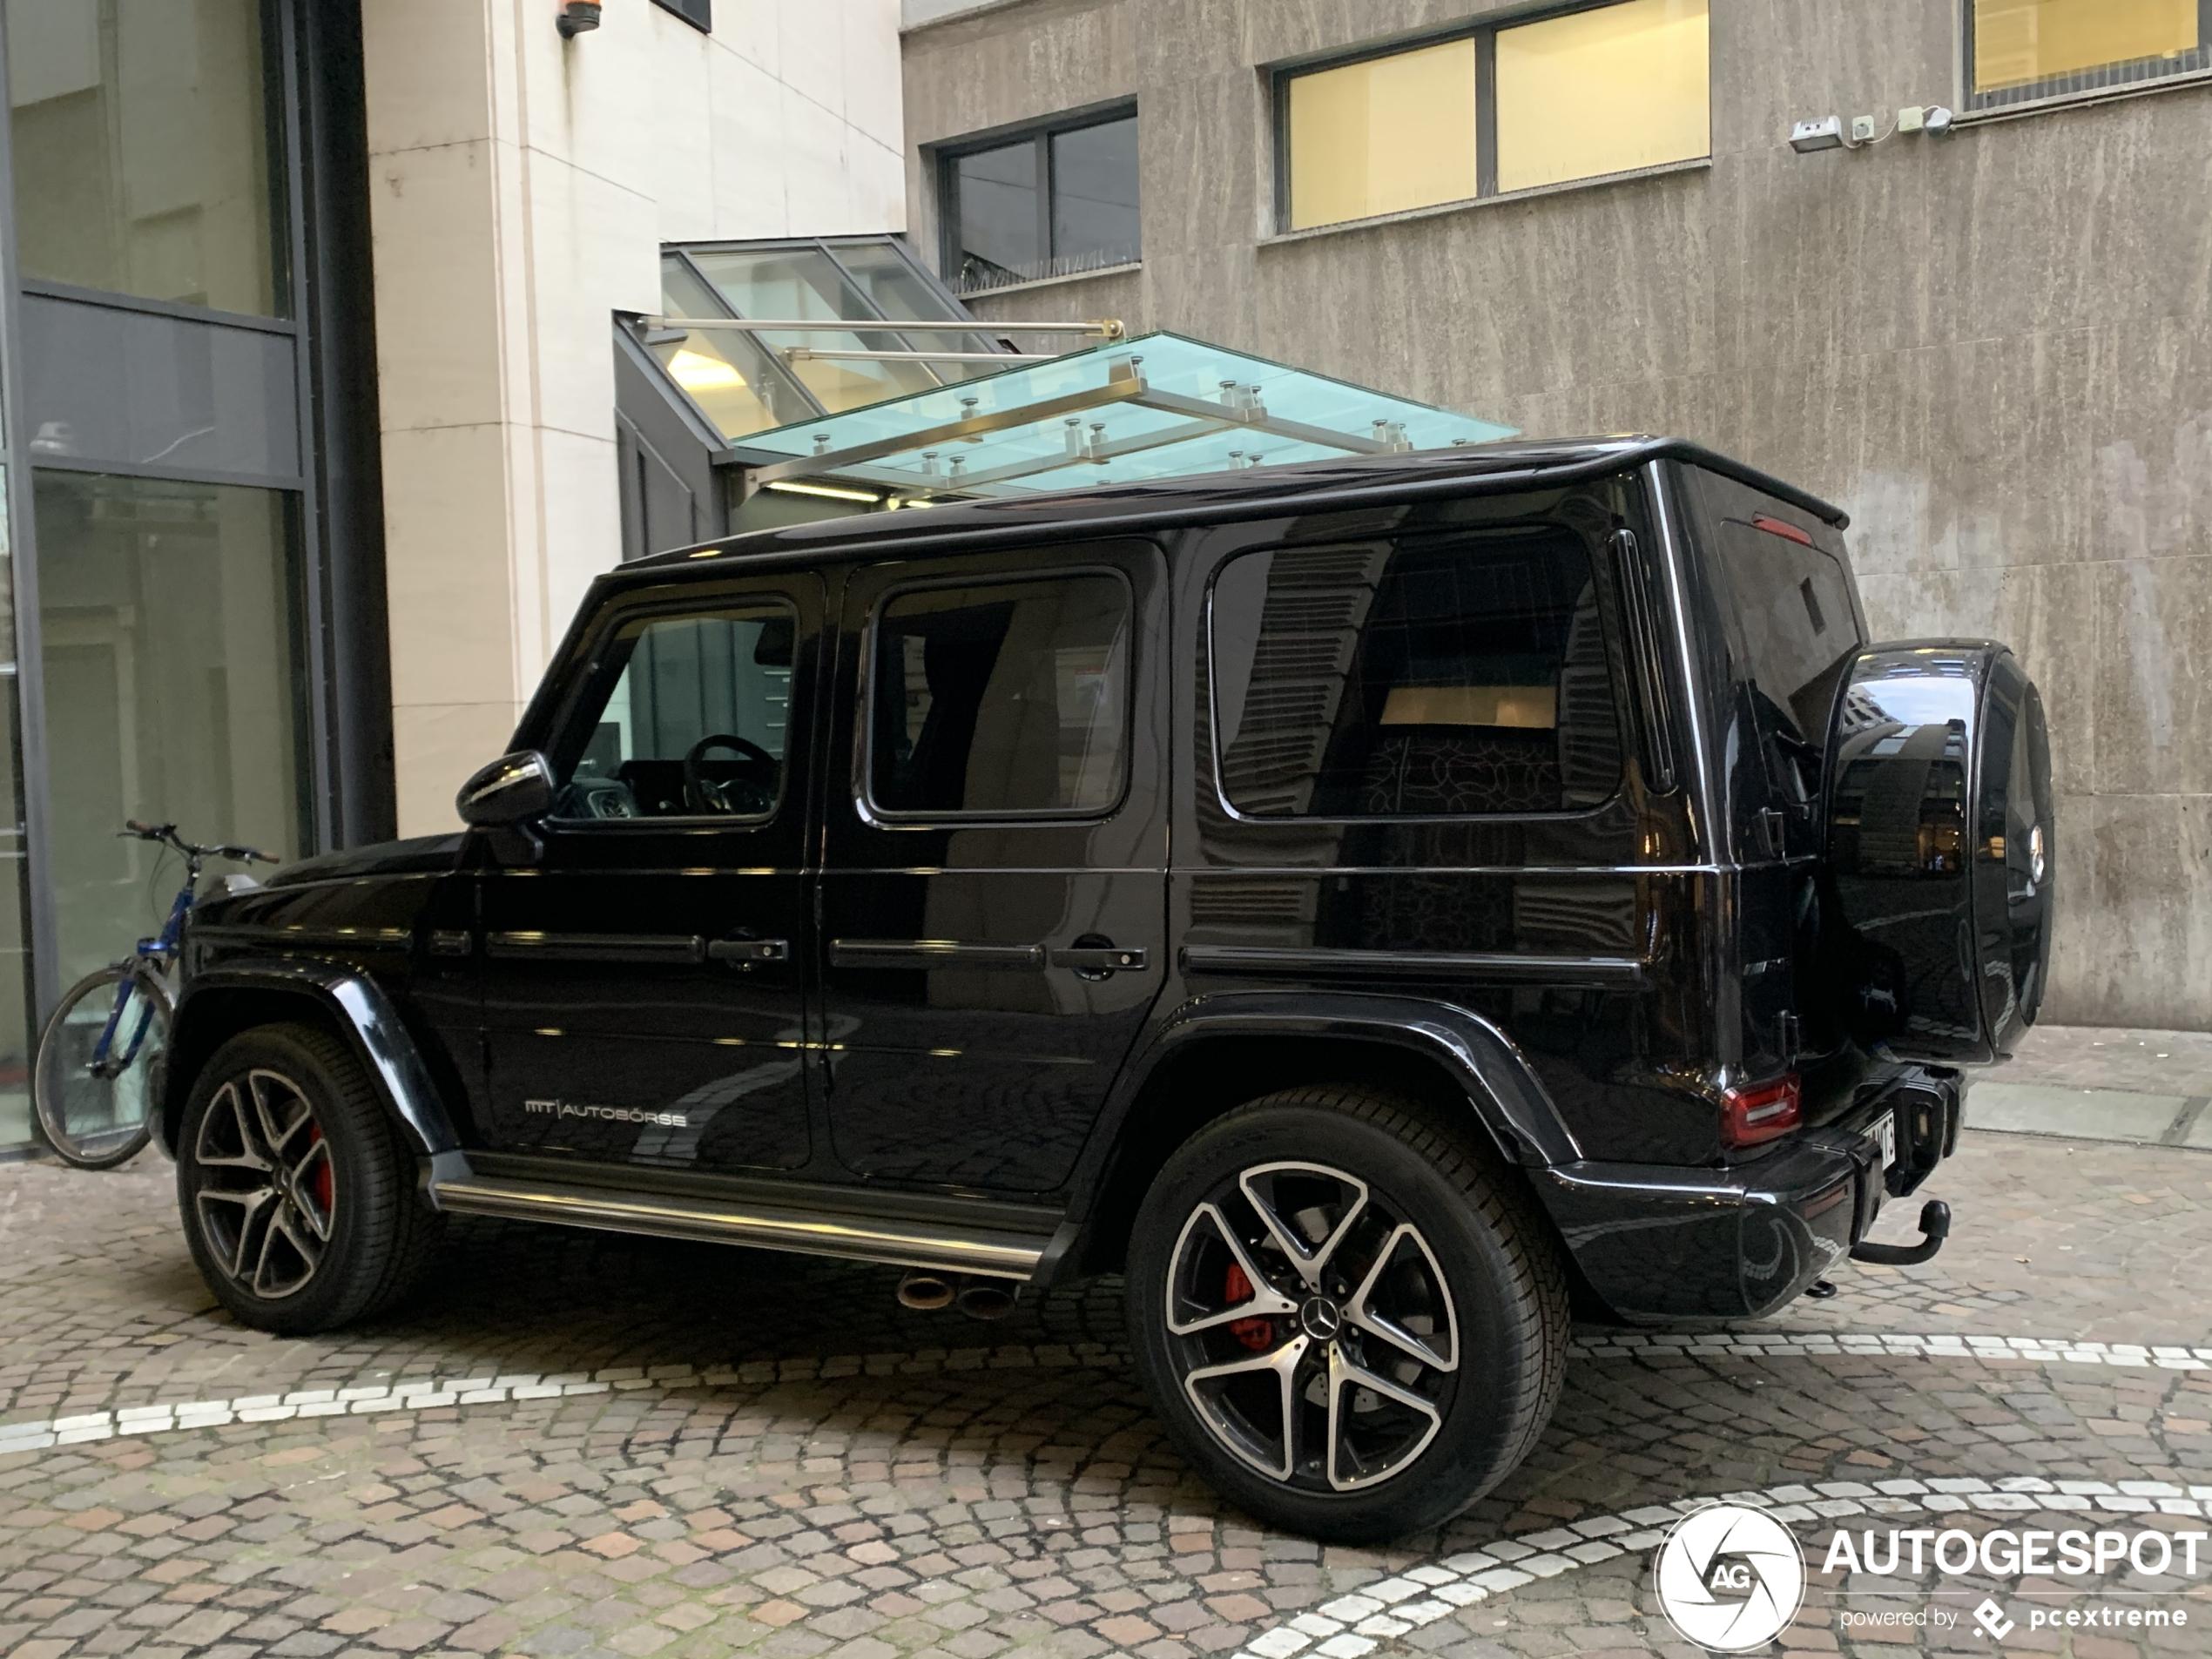 Mercedes-AMG G 63 W463 2018 - 8 May 2020 - Autogespot